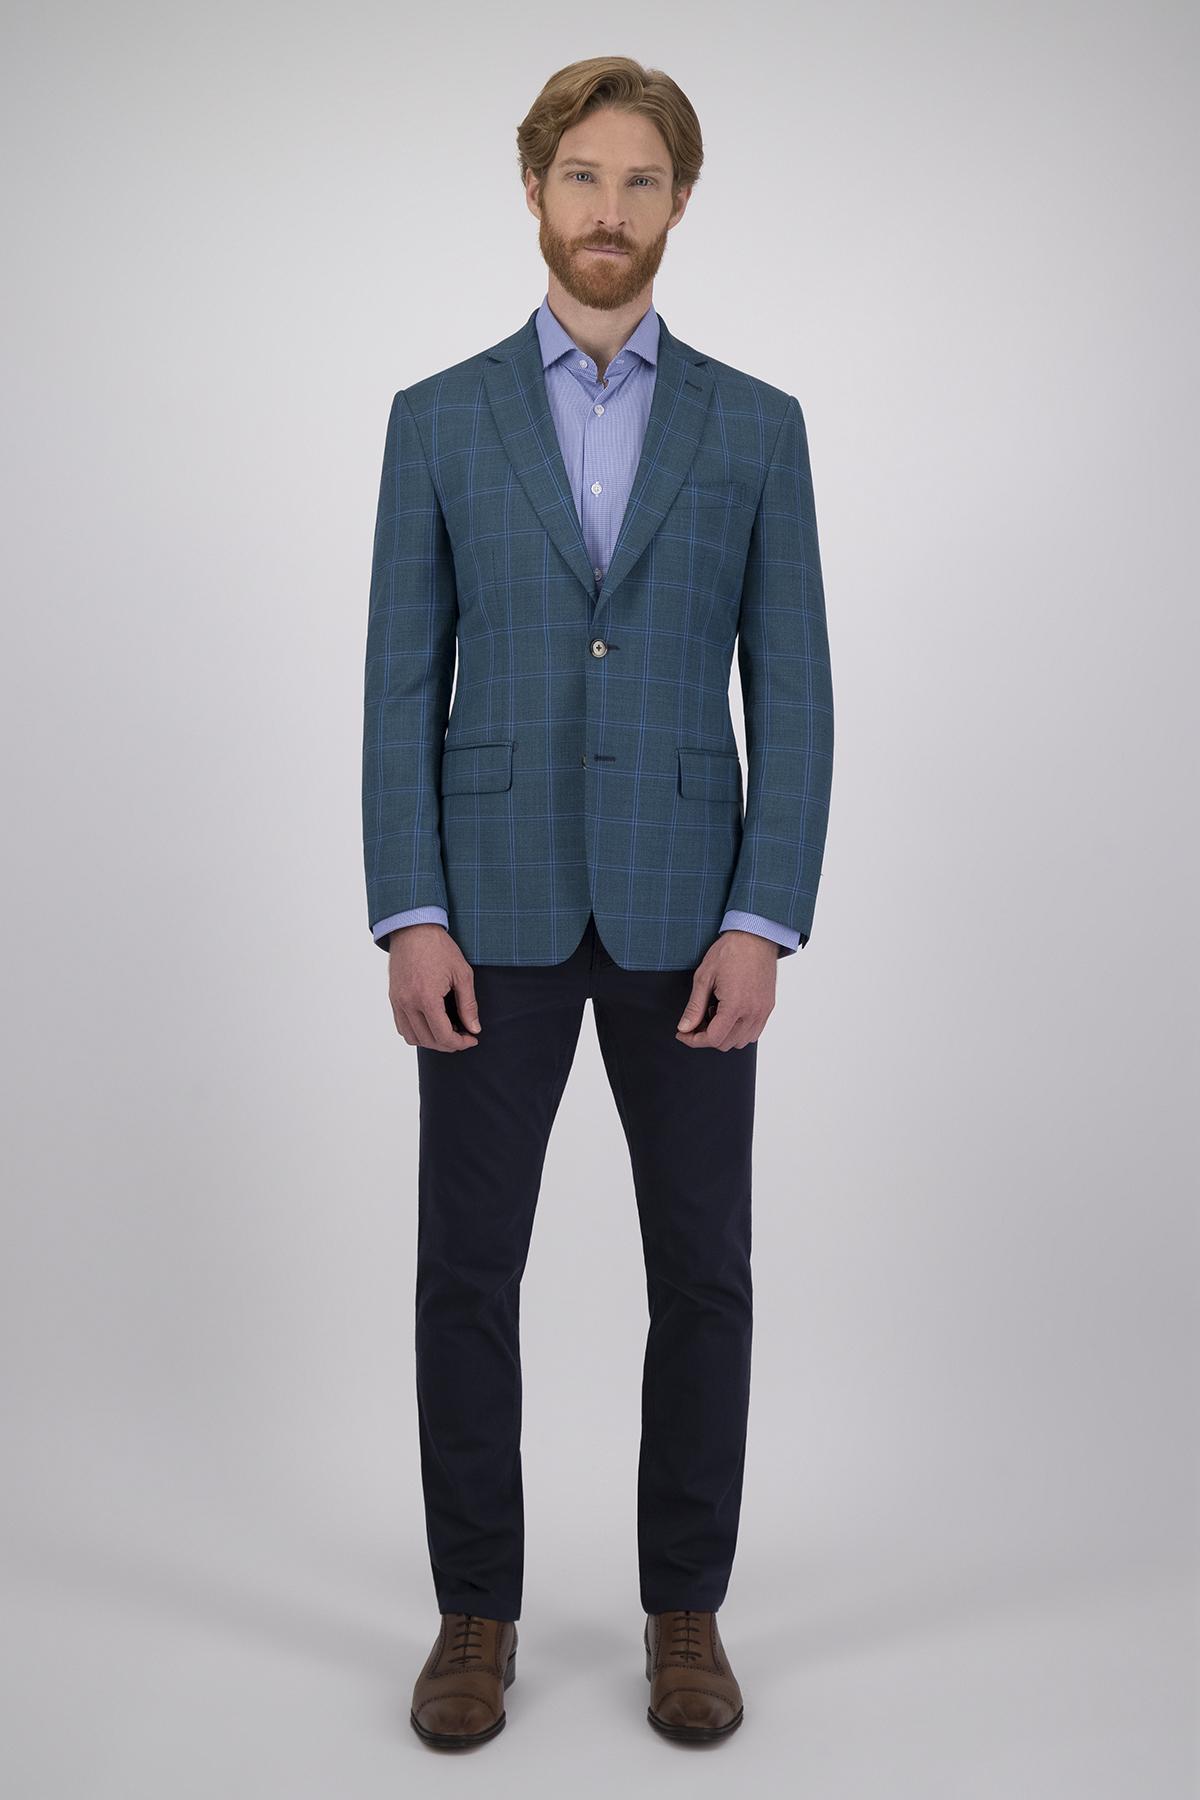 Saco Calderoni Couture Verde a Cuadros, Corte Regular, Tejido 100% Lana.